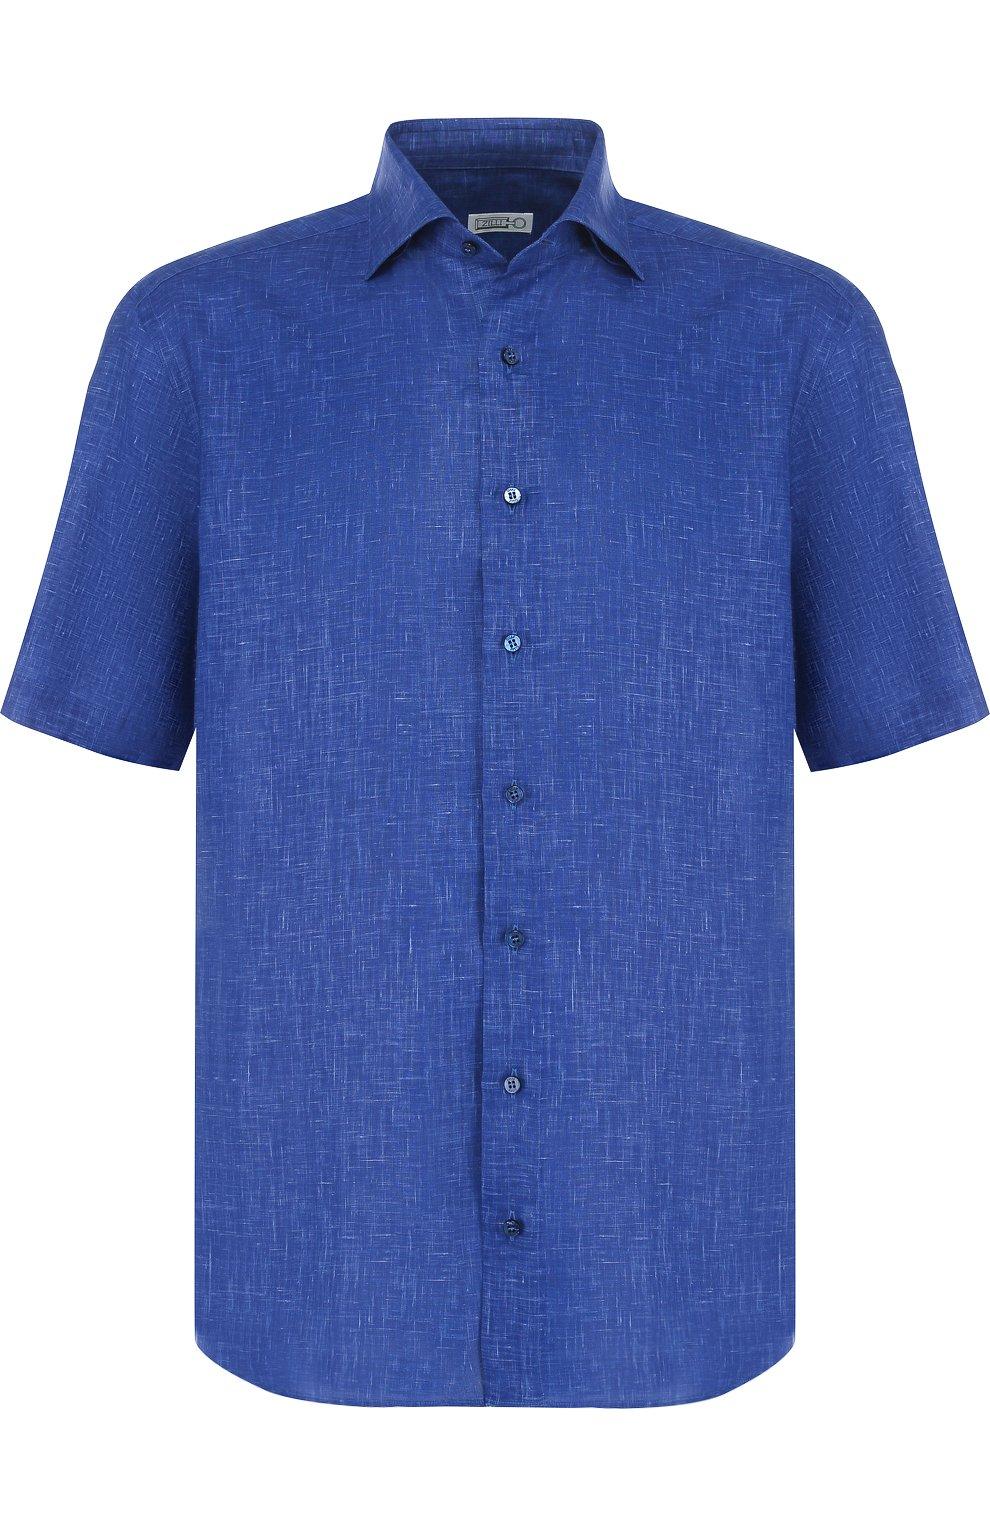 Мужская льняная рубашка с короткими рукавами ZILLI темно-синего цвета, арт. MFP-MERCU-17092/0006 | Фото 1